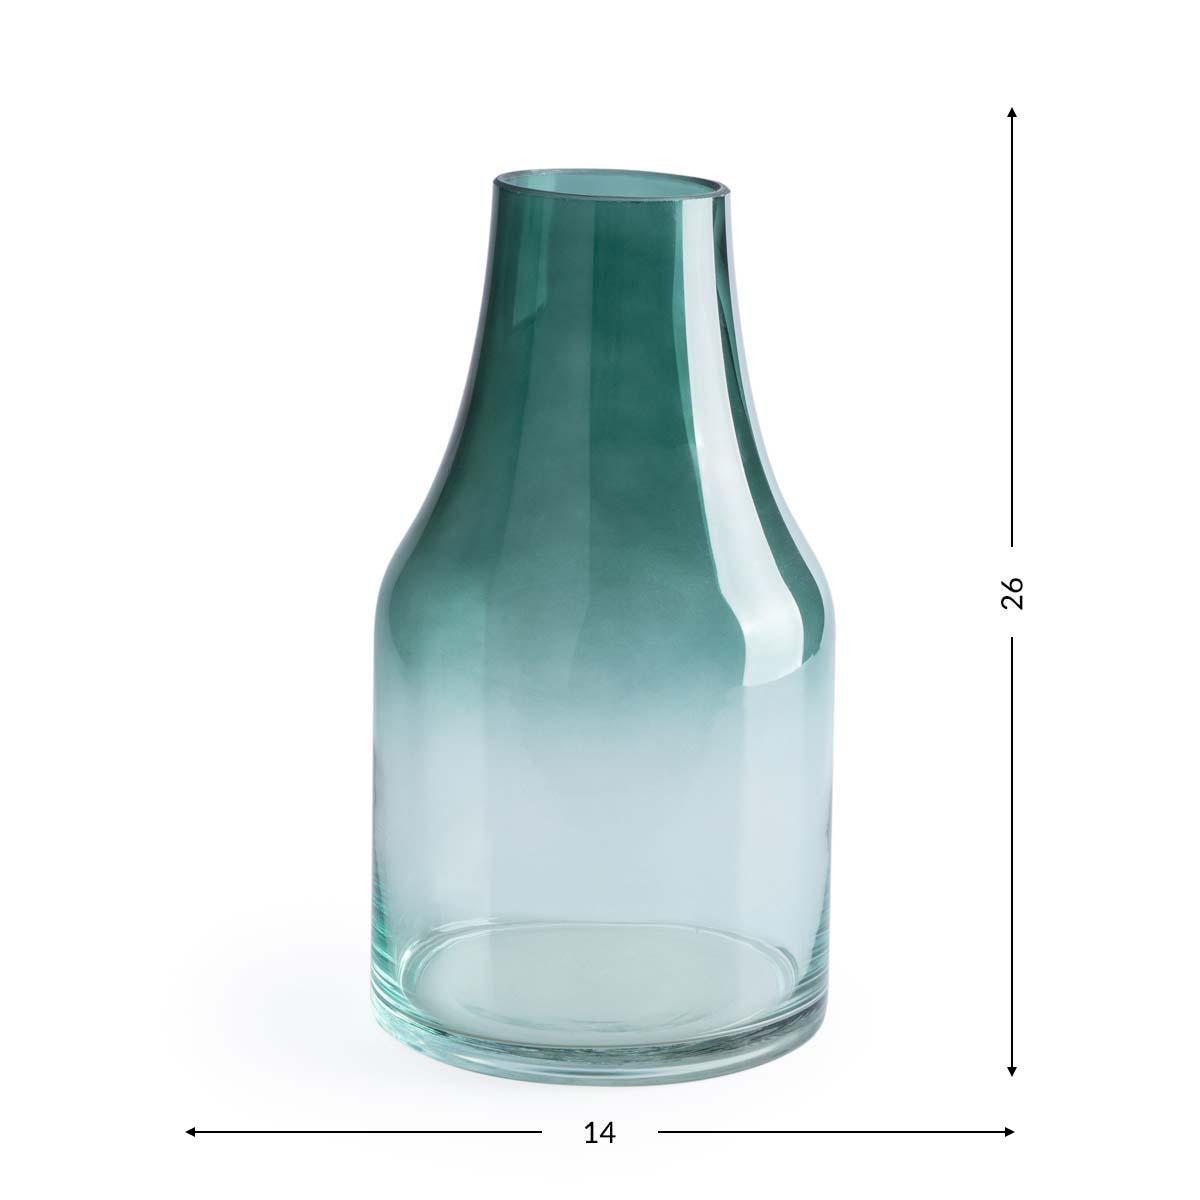 Vase Cancun, crystal, color green and clear, dégradé, vase, 26x14x14 cm